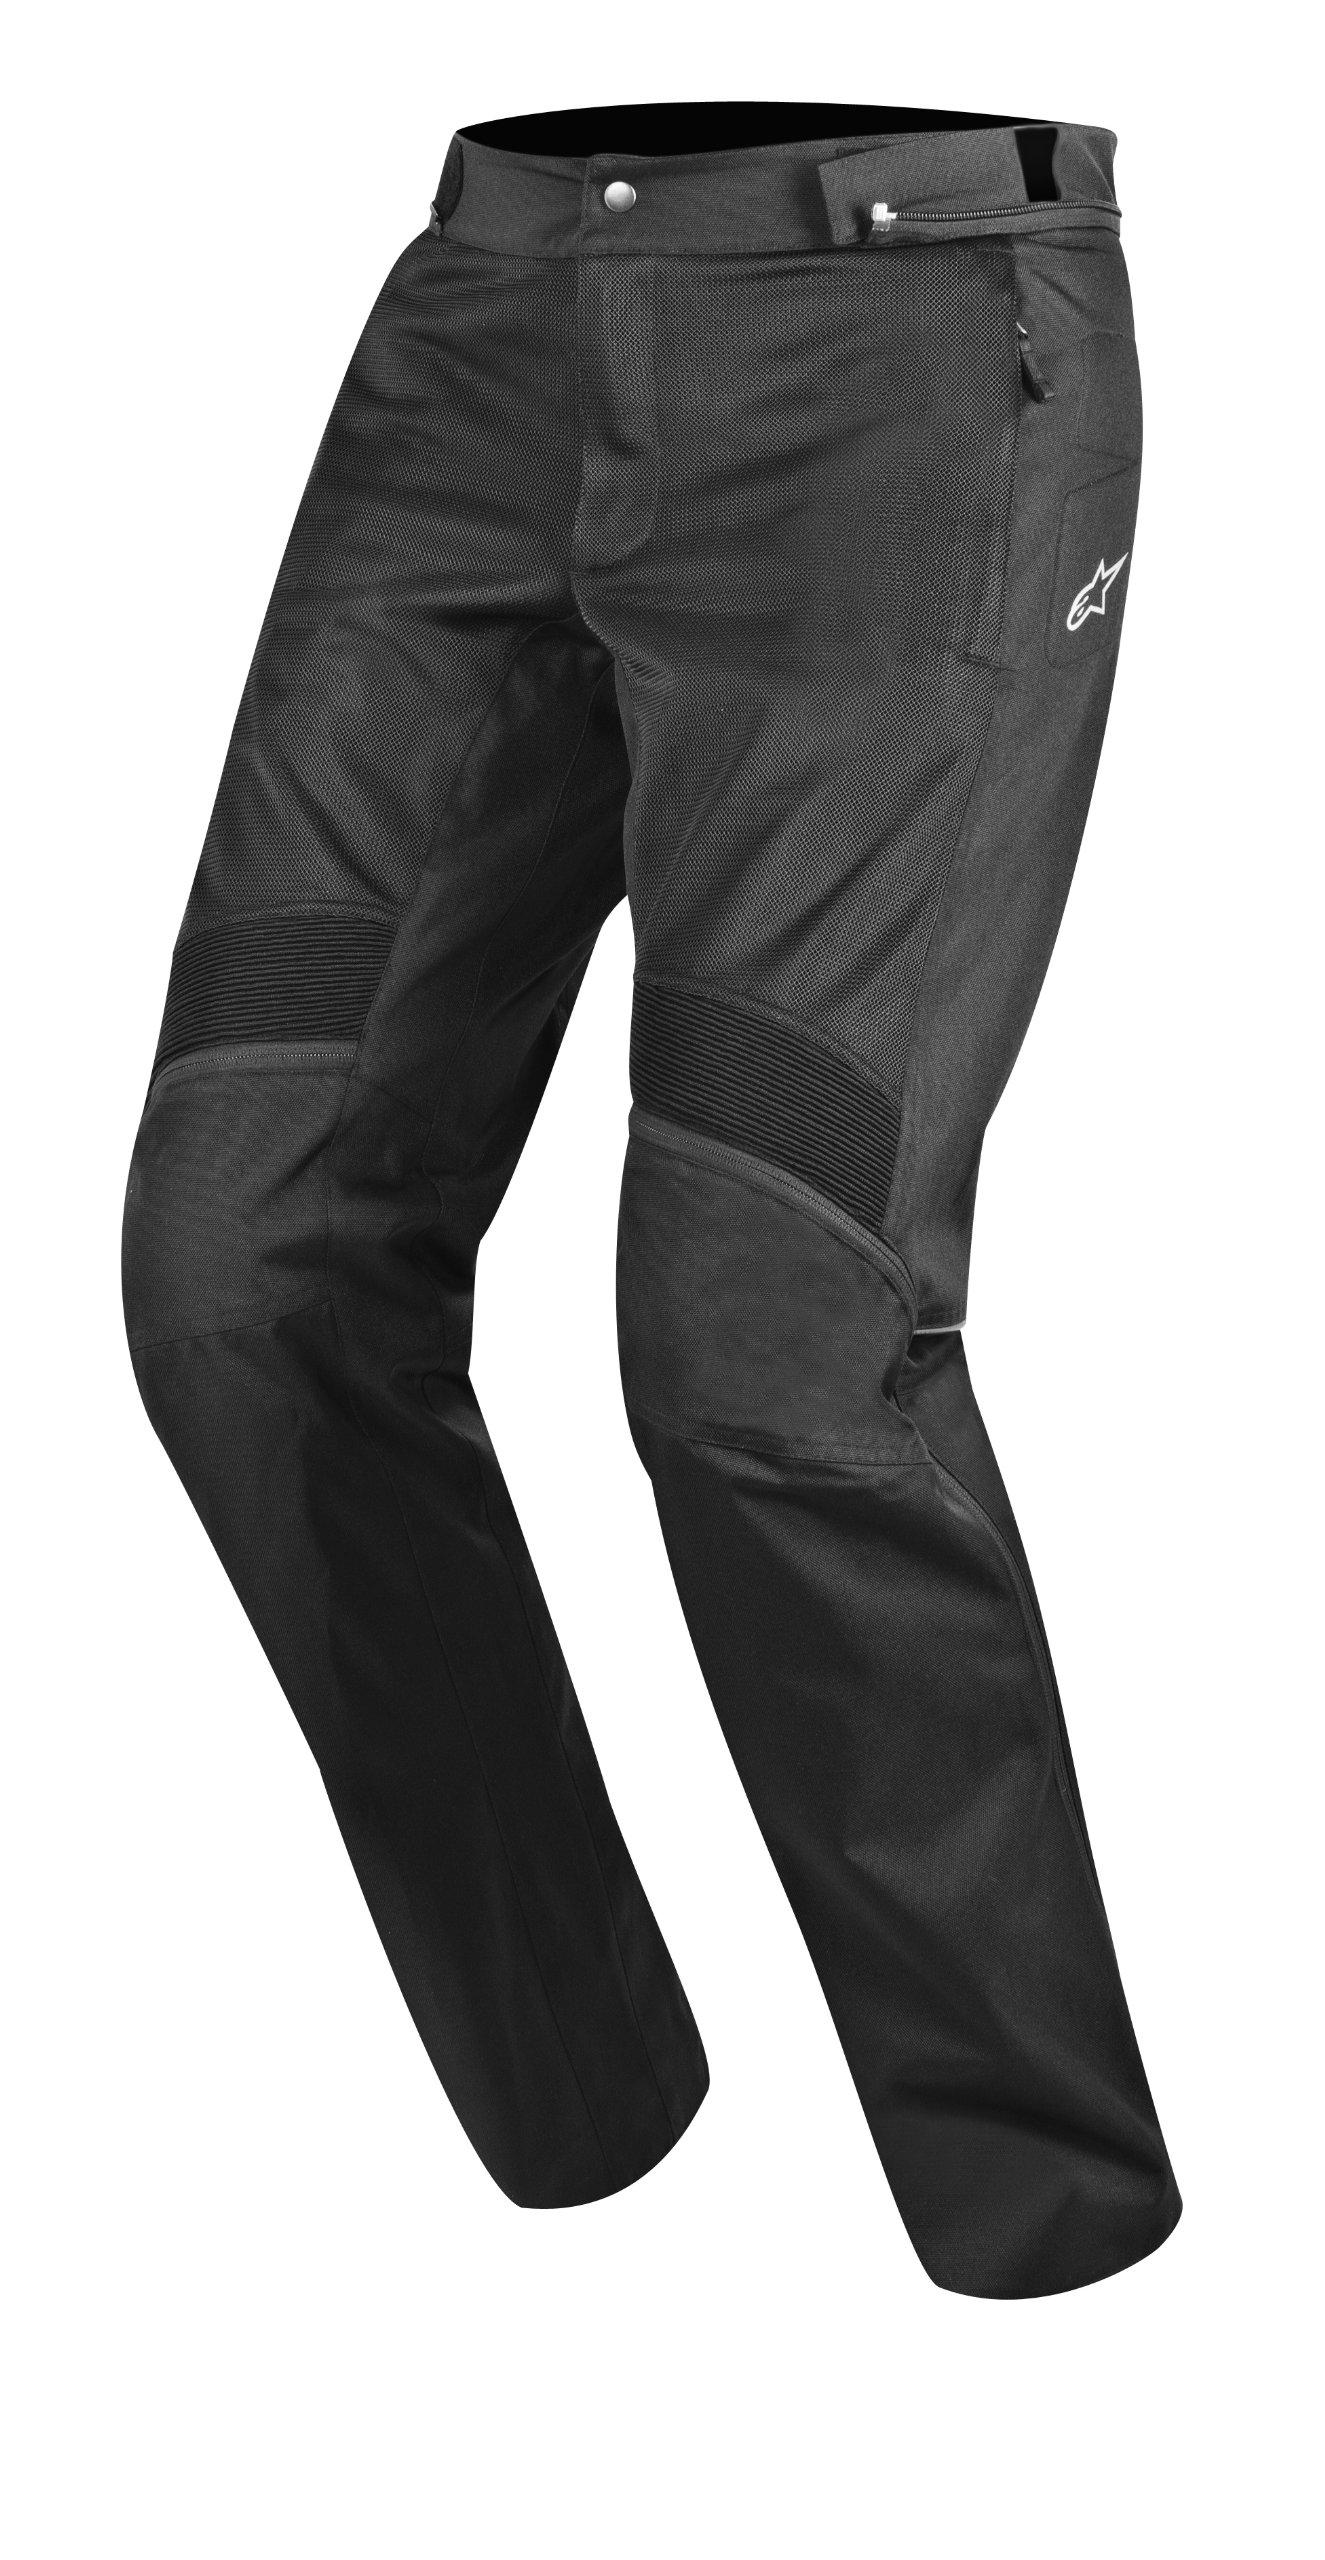 Alpinestars Oxygen Air Men's Sports Bike Motorcycle Pants - Black / Size Small